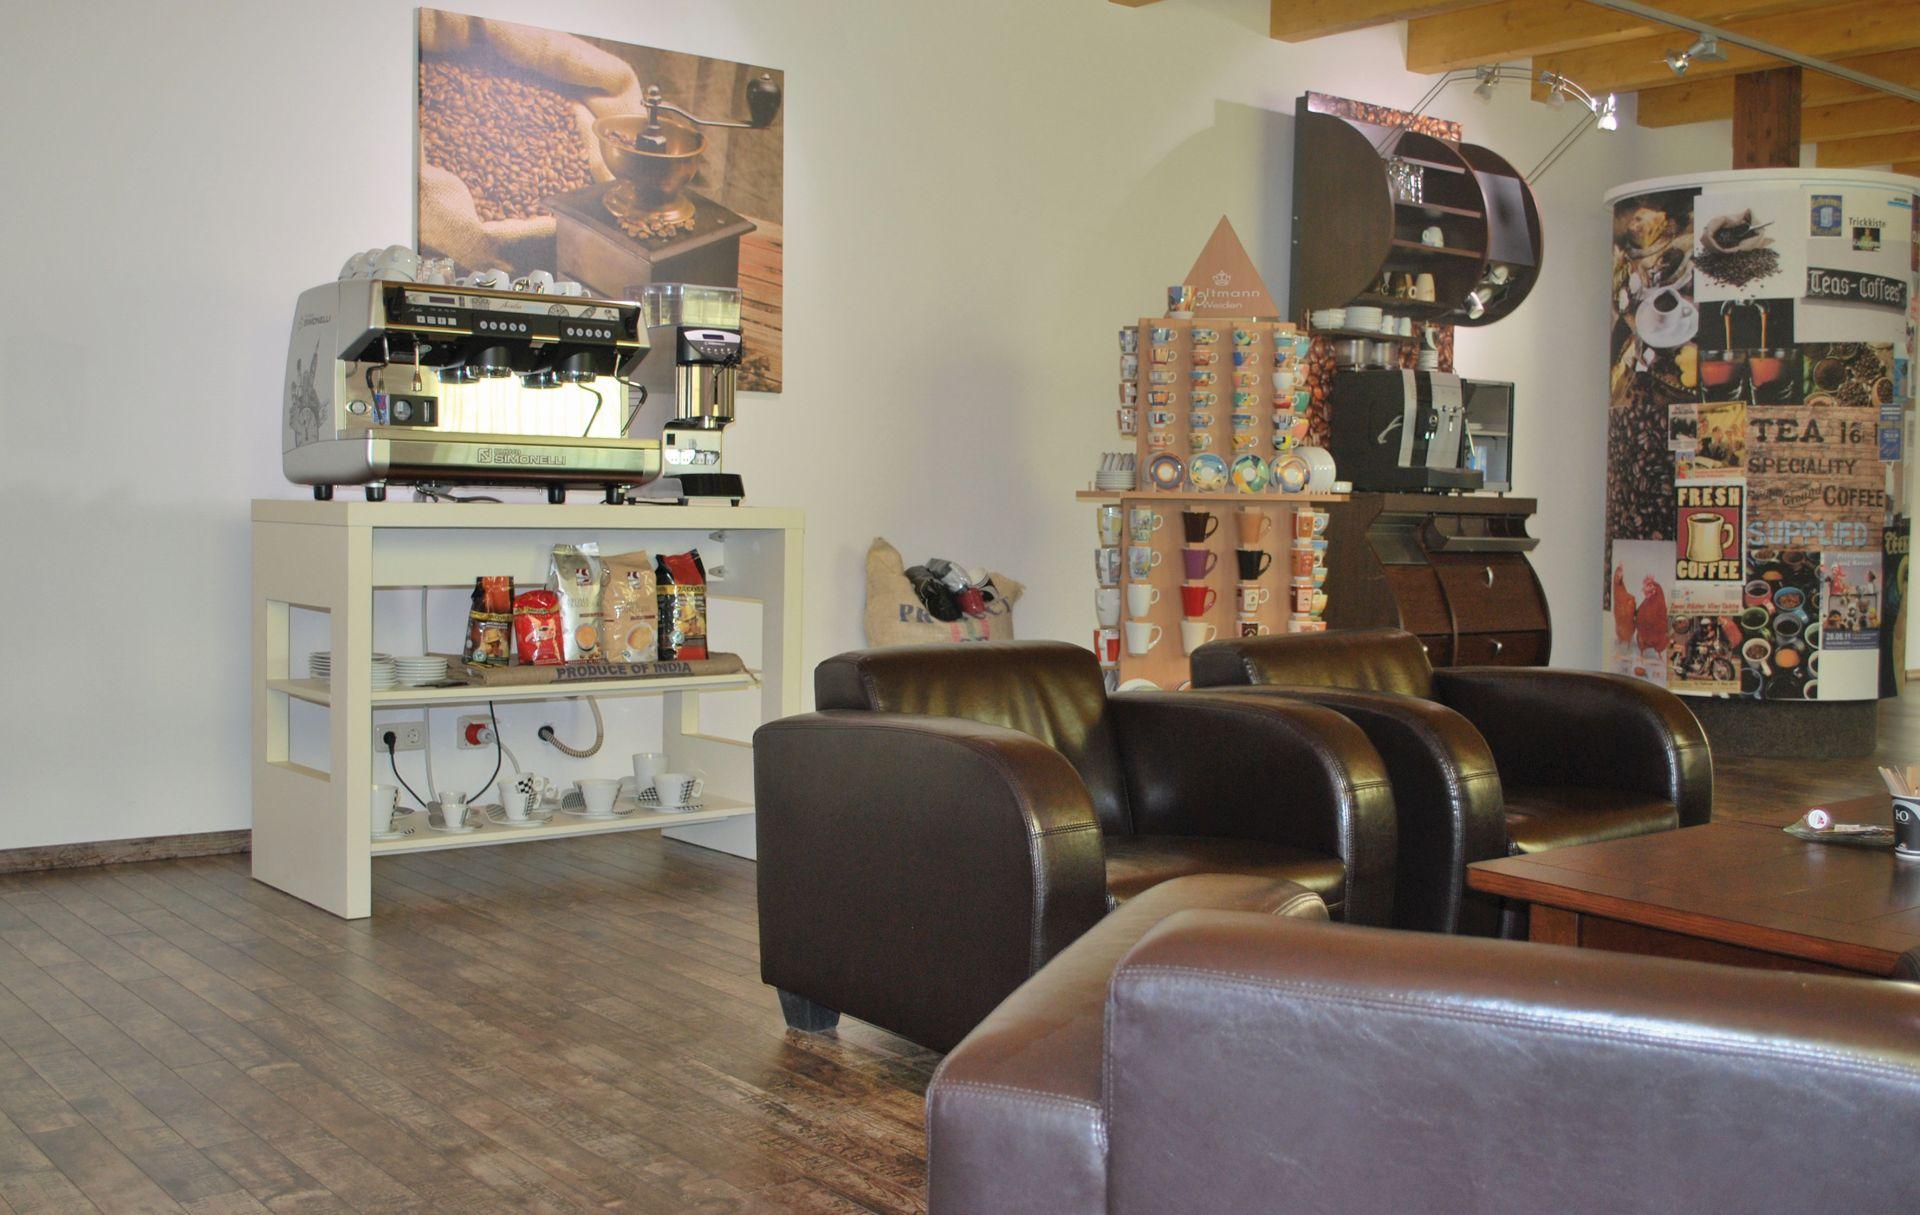 New Gastroline Kaffeevollautomaten Ausstellung